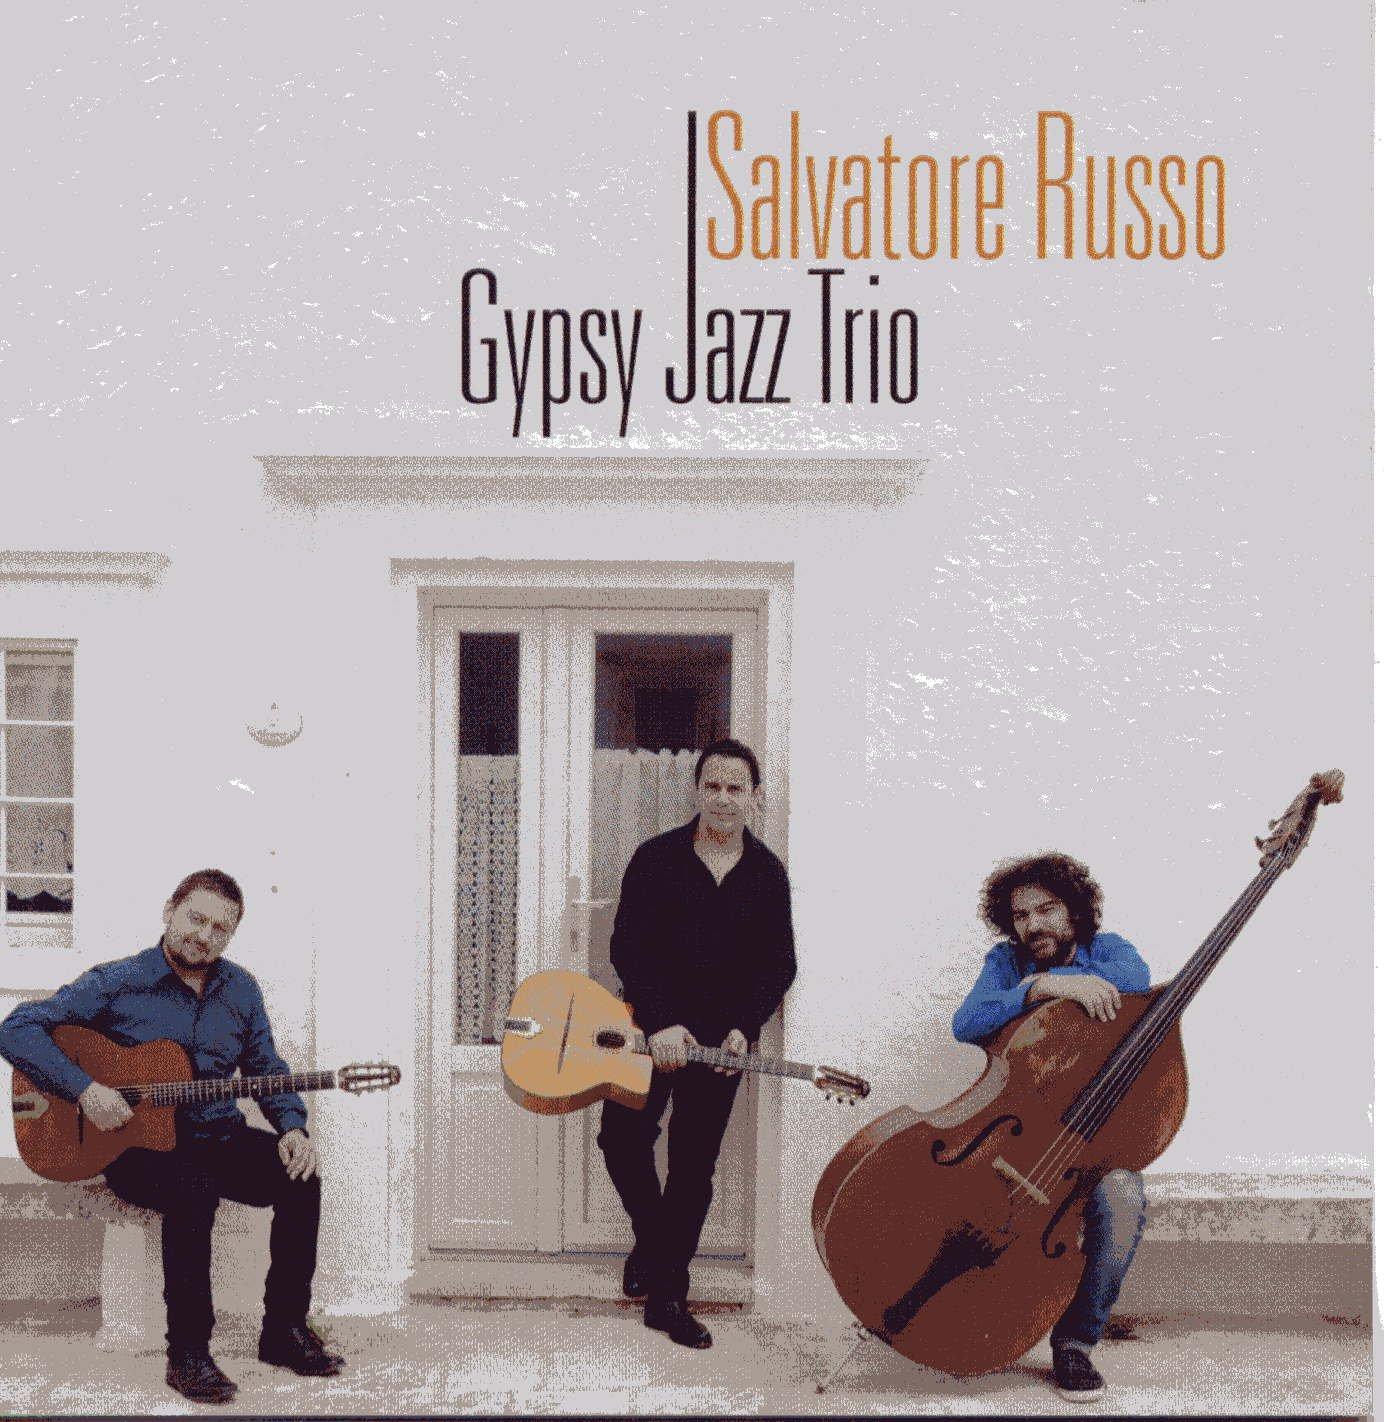 Salvatore Russo</br>Gypsy Jazz Trio</br>Emme Label, 2016